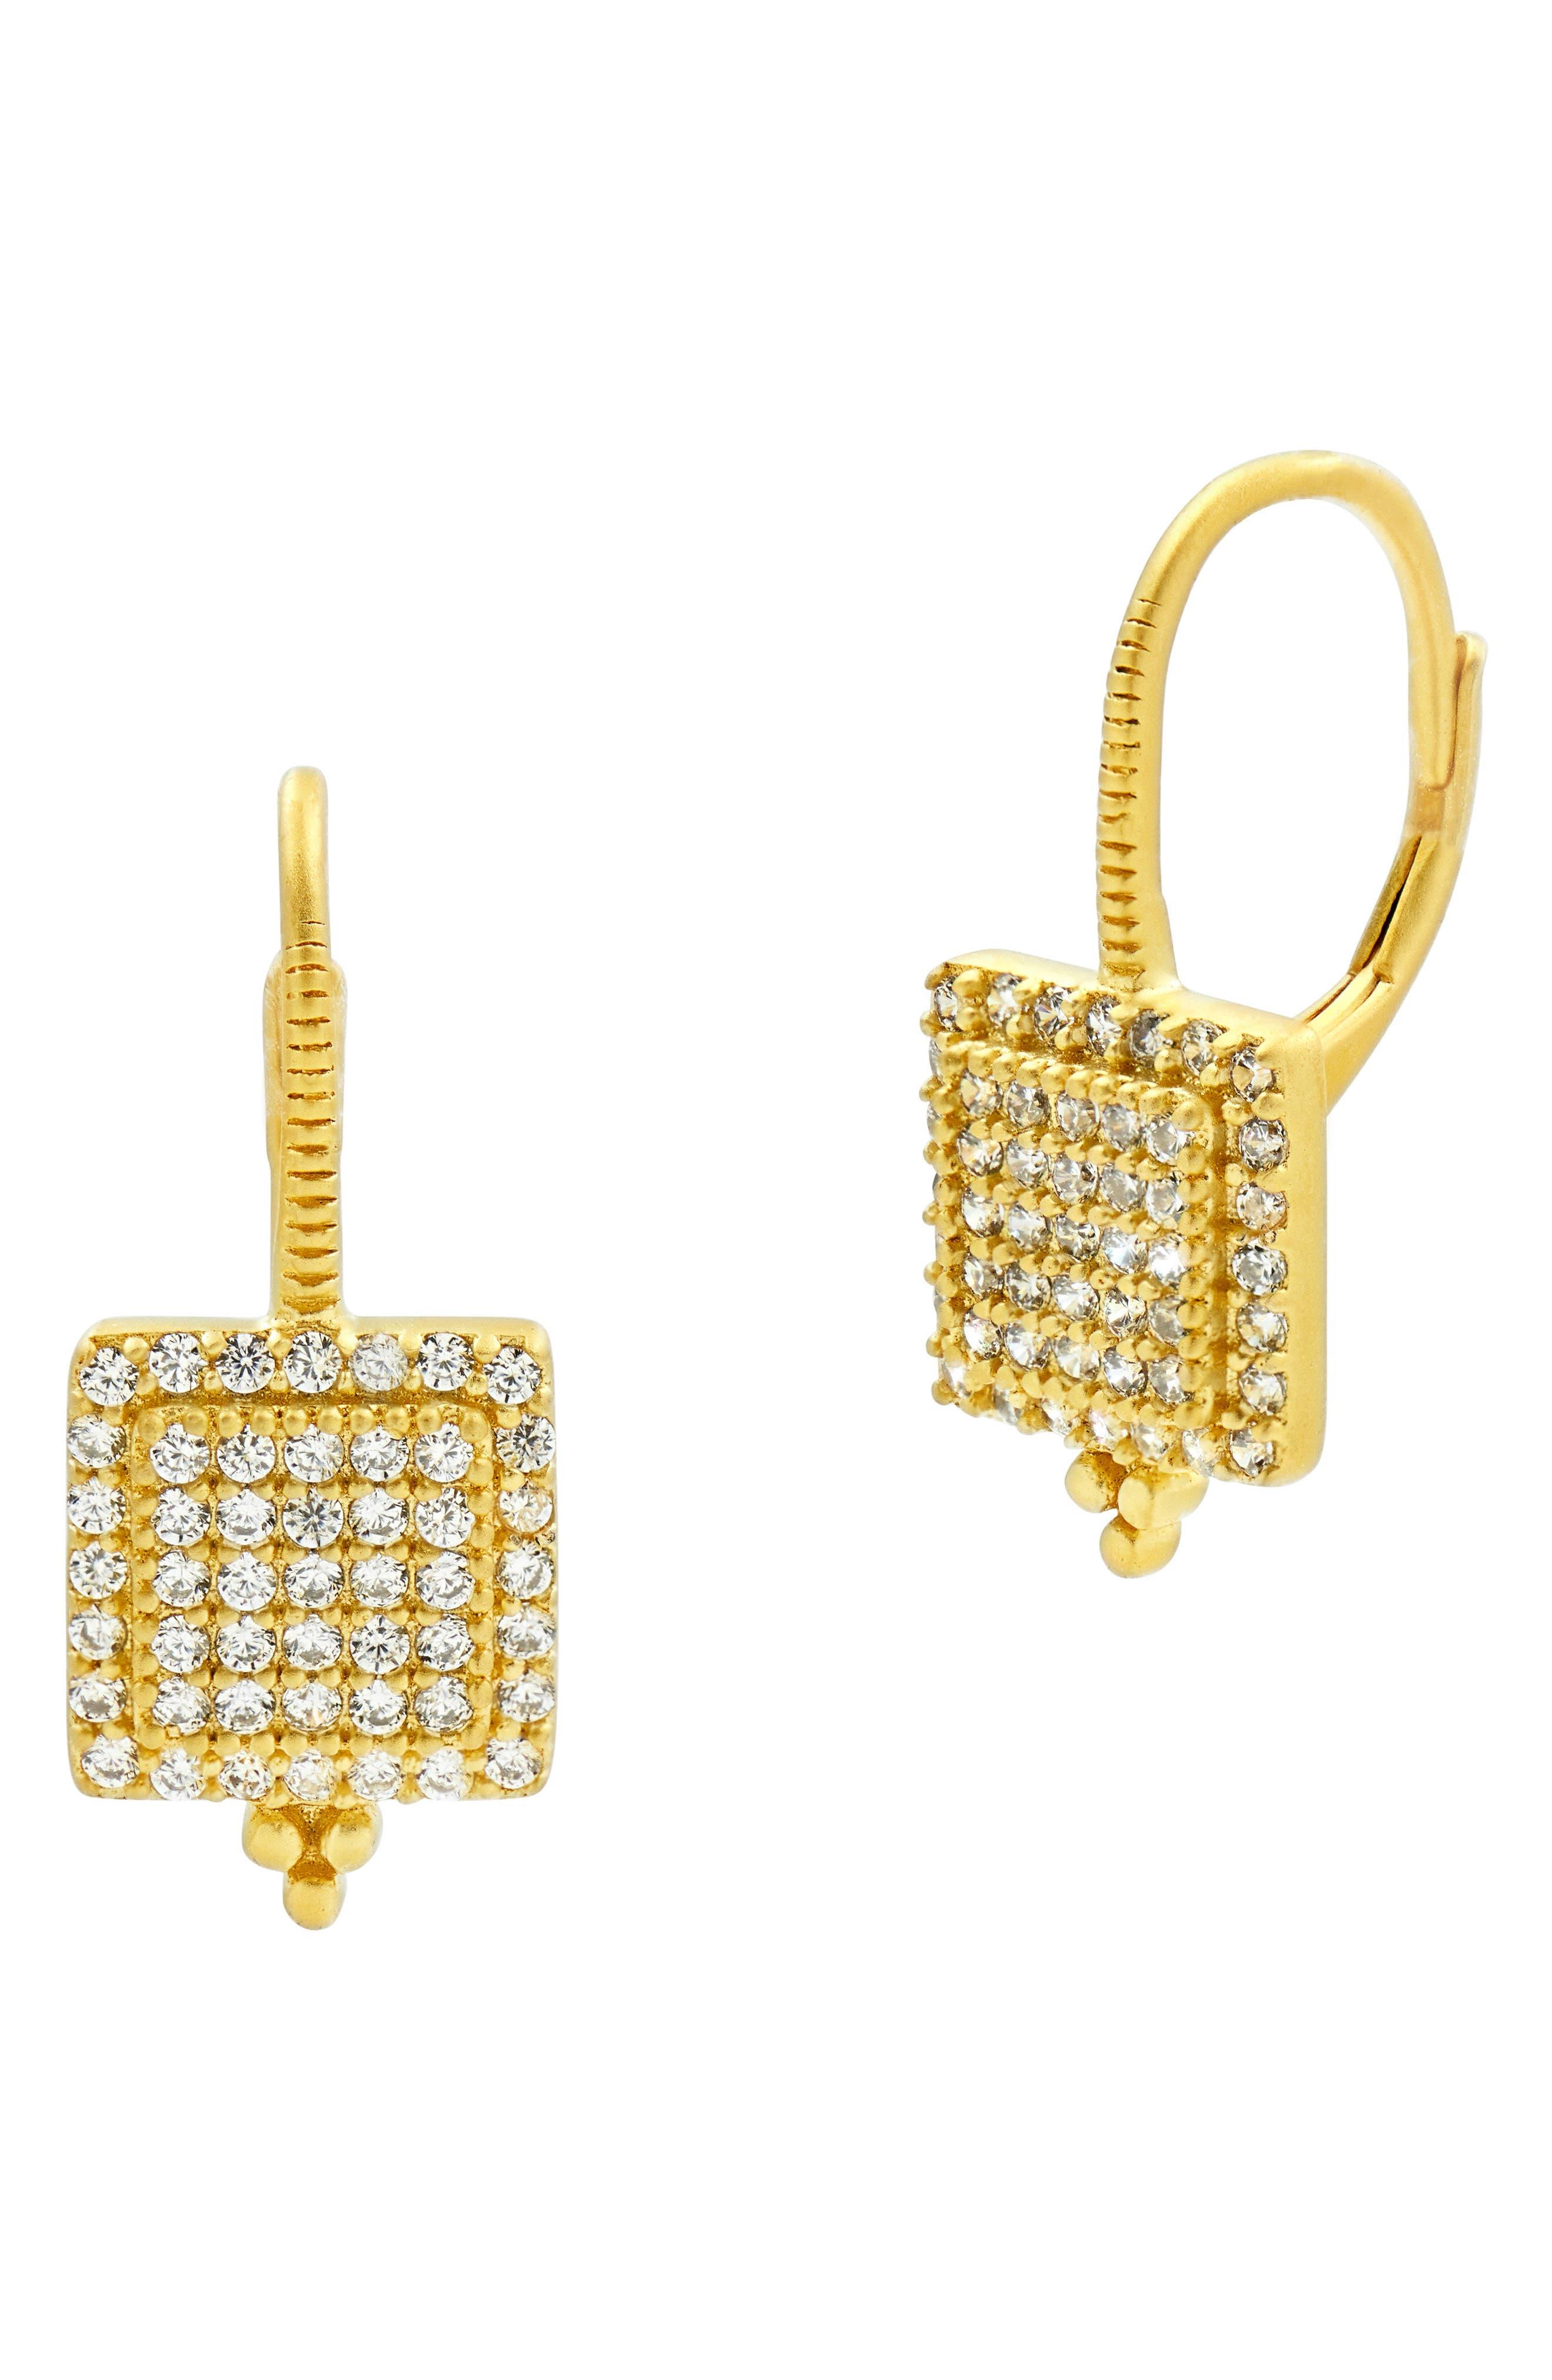 Main Image - FREIDA ROTHMAN Ocean Azure Crystal Drop Earrings